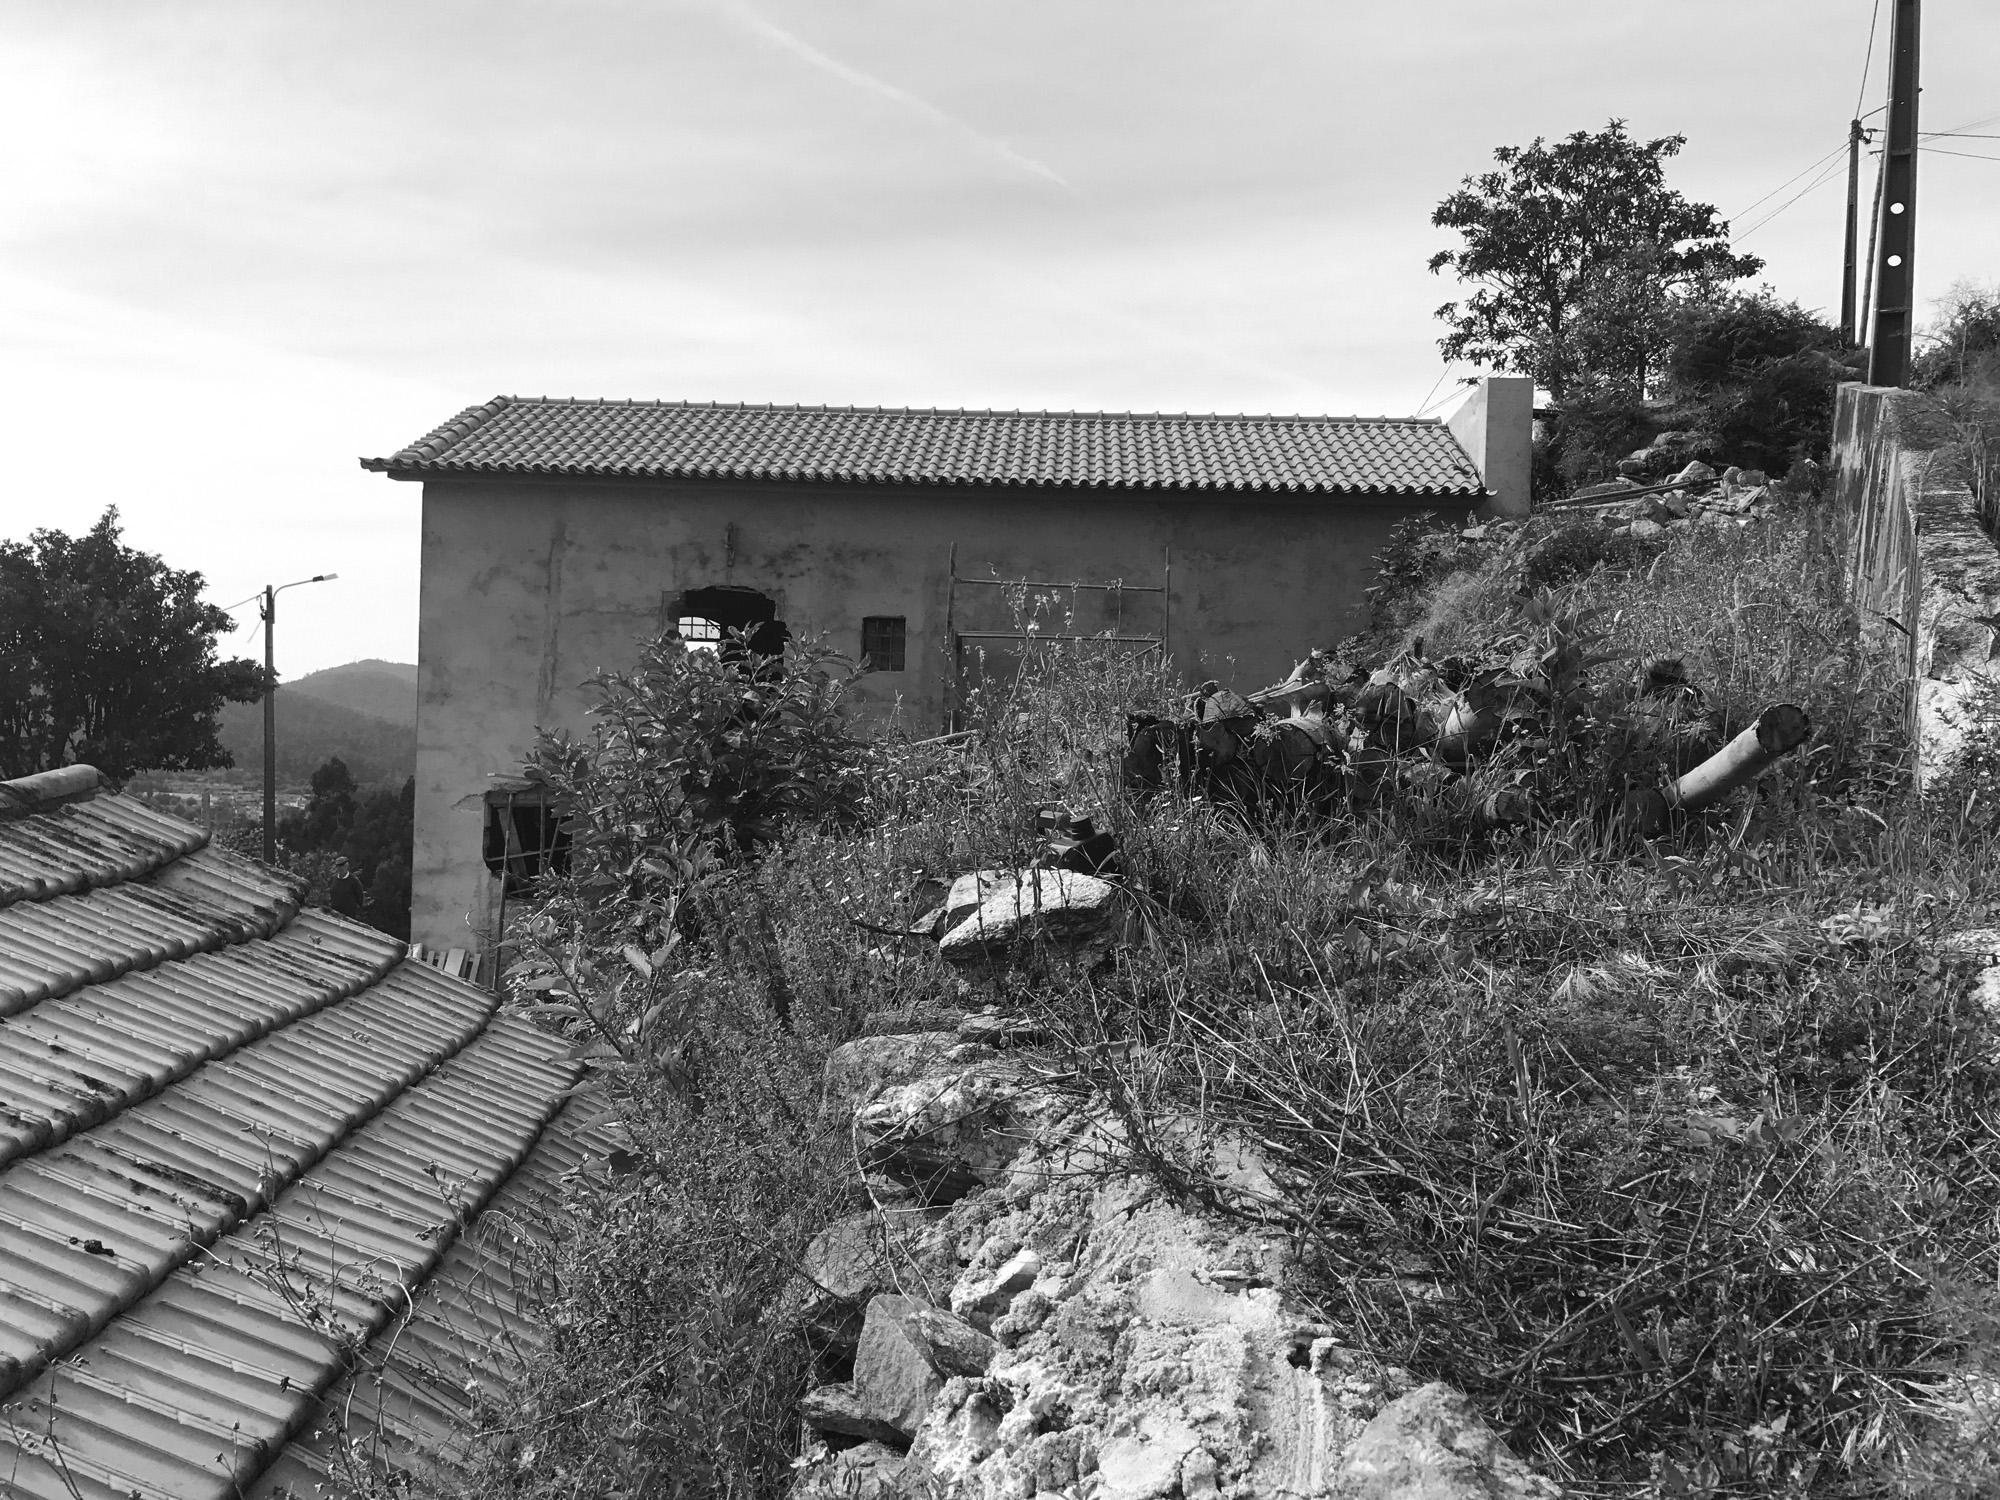 Moradia Folgorosa - Vale de Cambra - EVA atelier - Arquitectura - Obra - Arquitecto - Porto - EVA evolutionary architecture (8).jpg